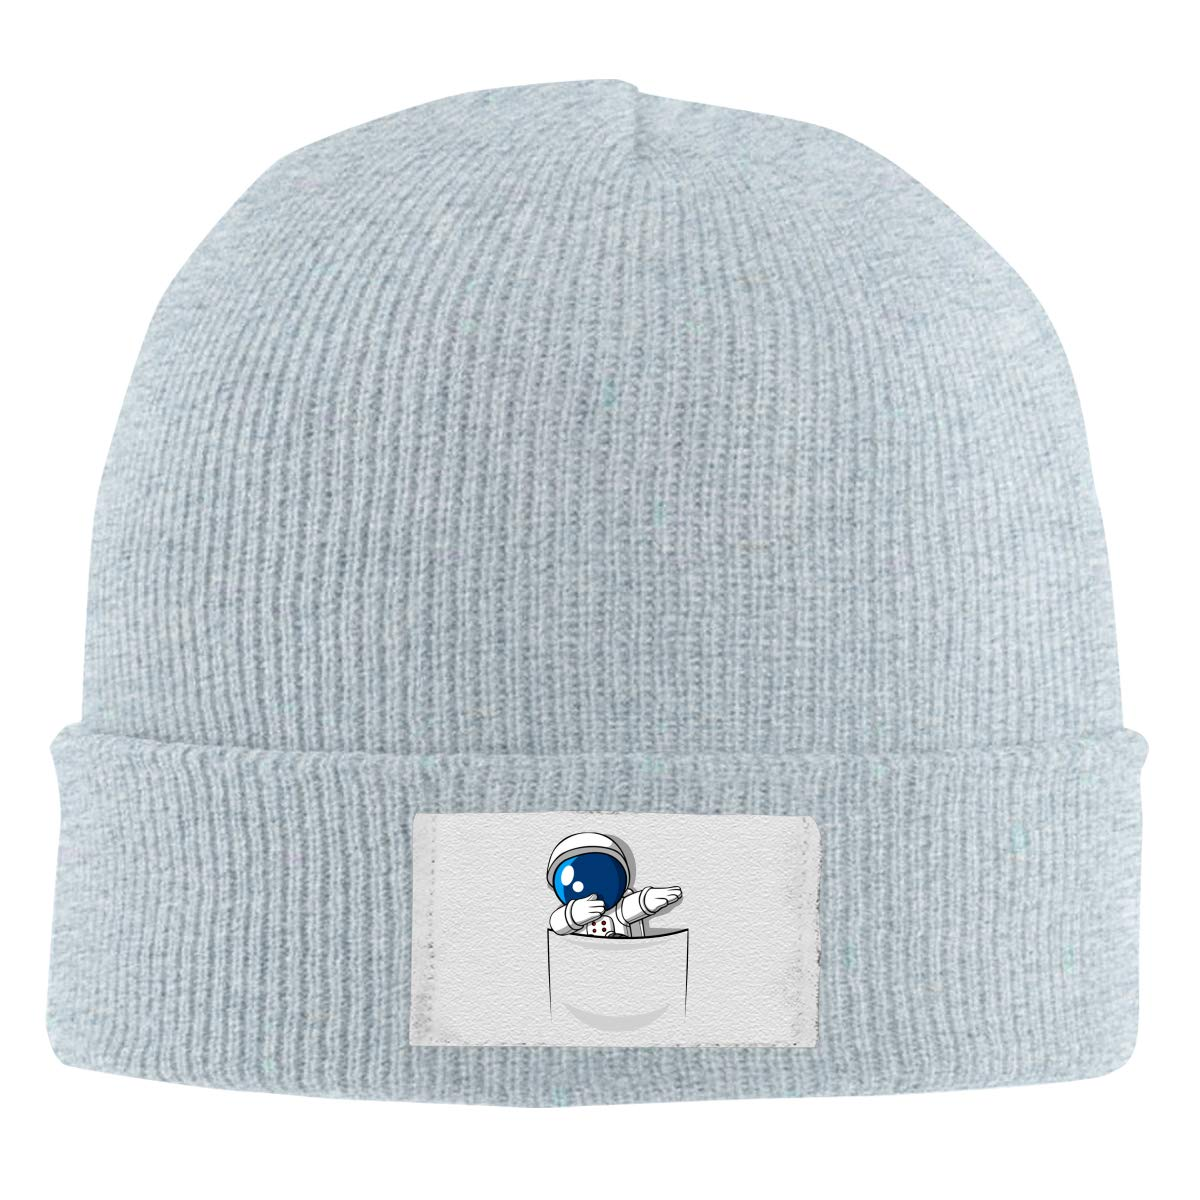 Stretchy Cuff Beanie Hat Black Dunpaiaa Skull Caps Dabbing Pocket Astronaut Winter Warm Knit Hats